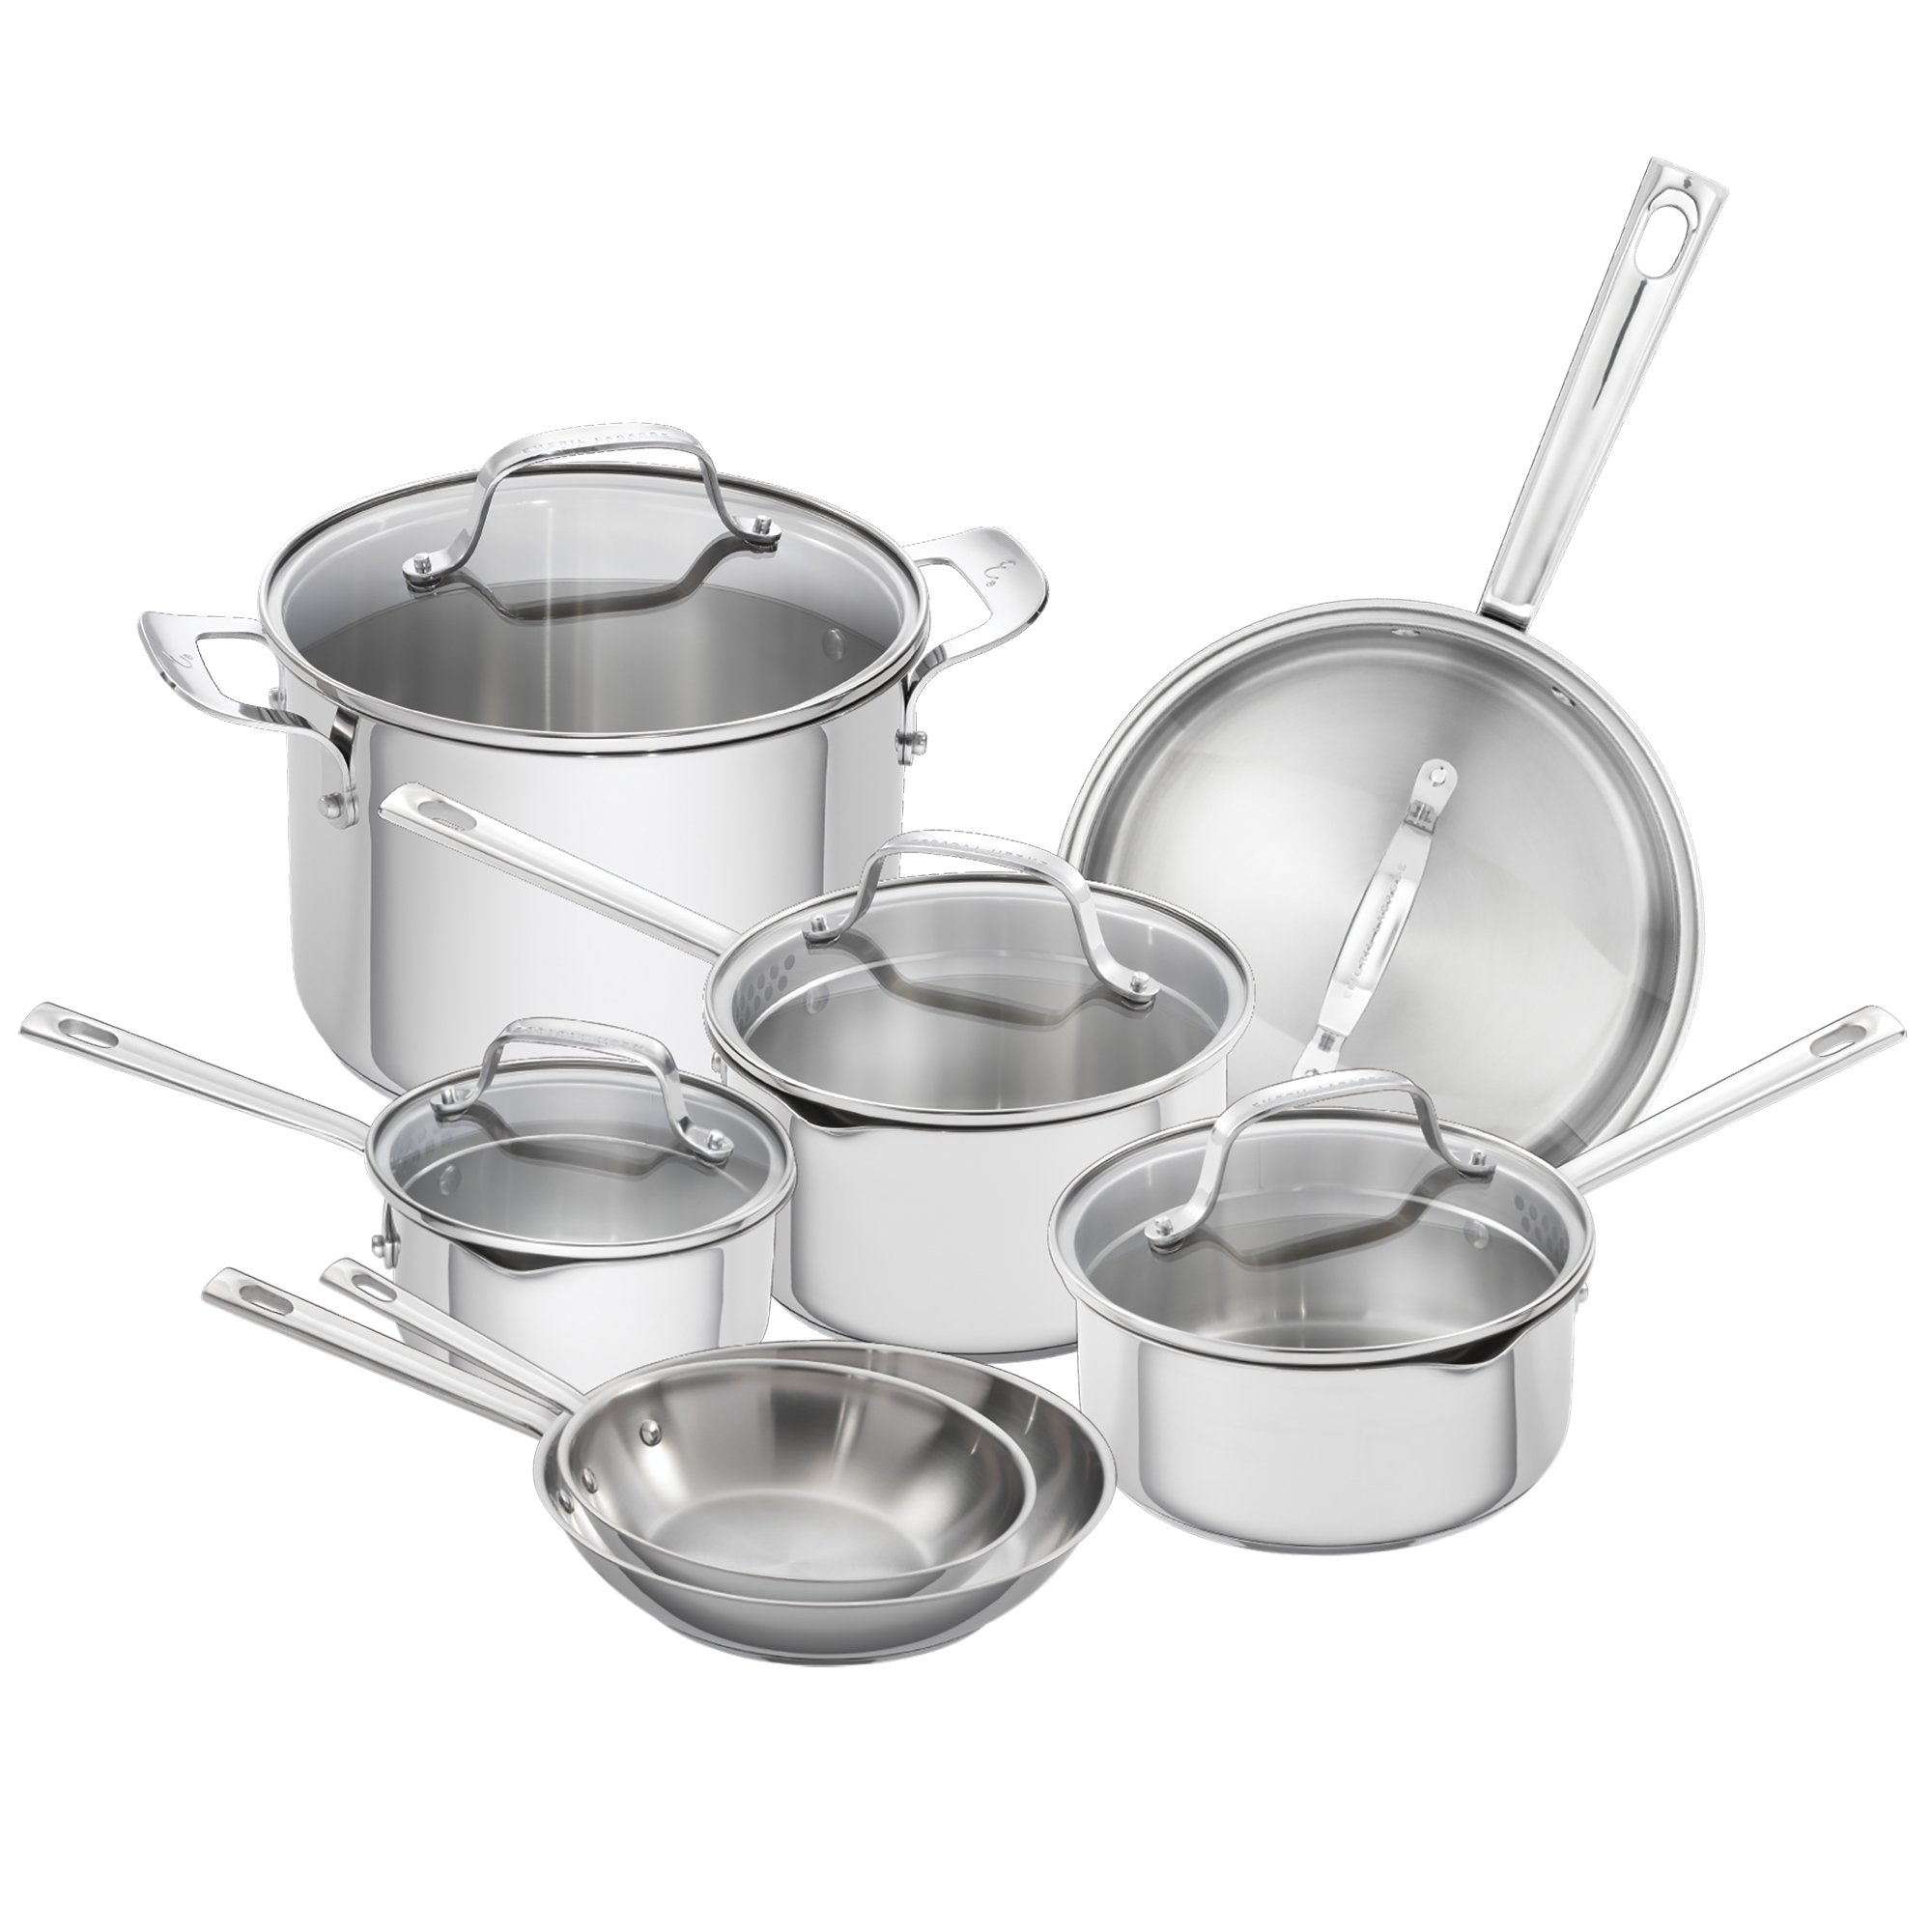 Emeril Lagasse 62950 Emeril cookware set, Silver